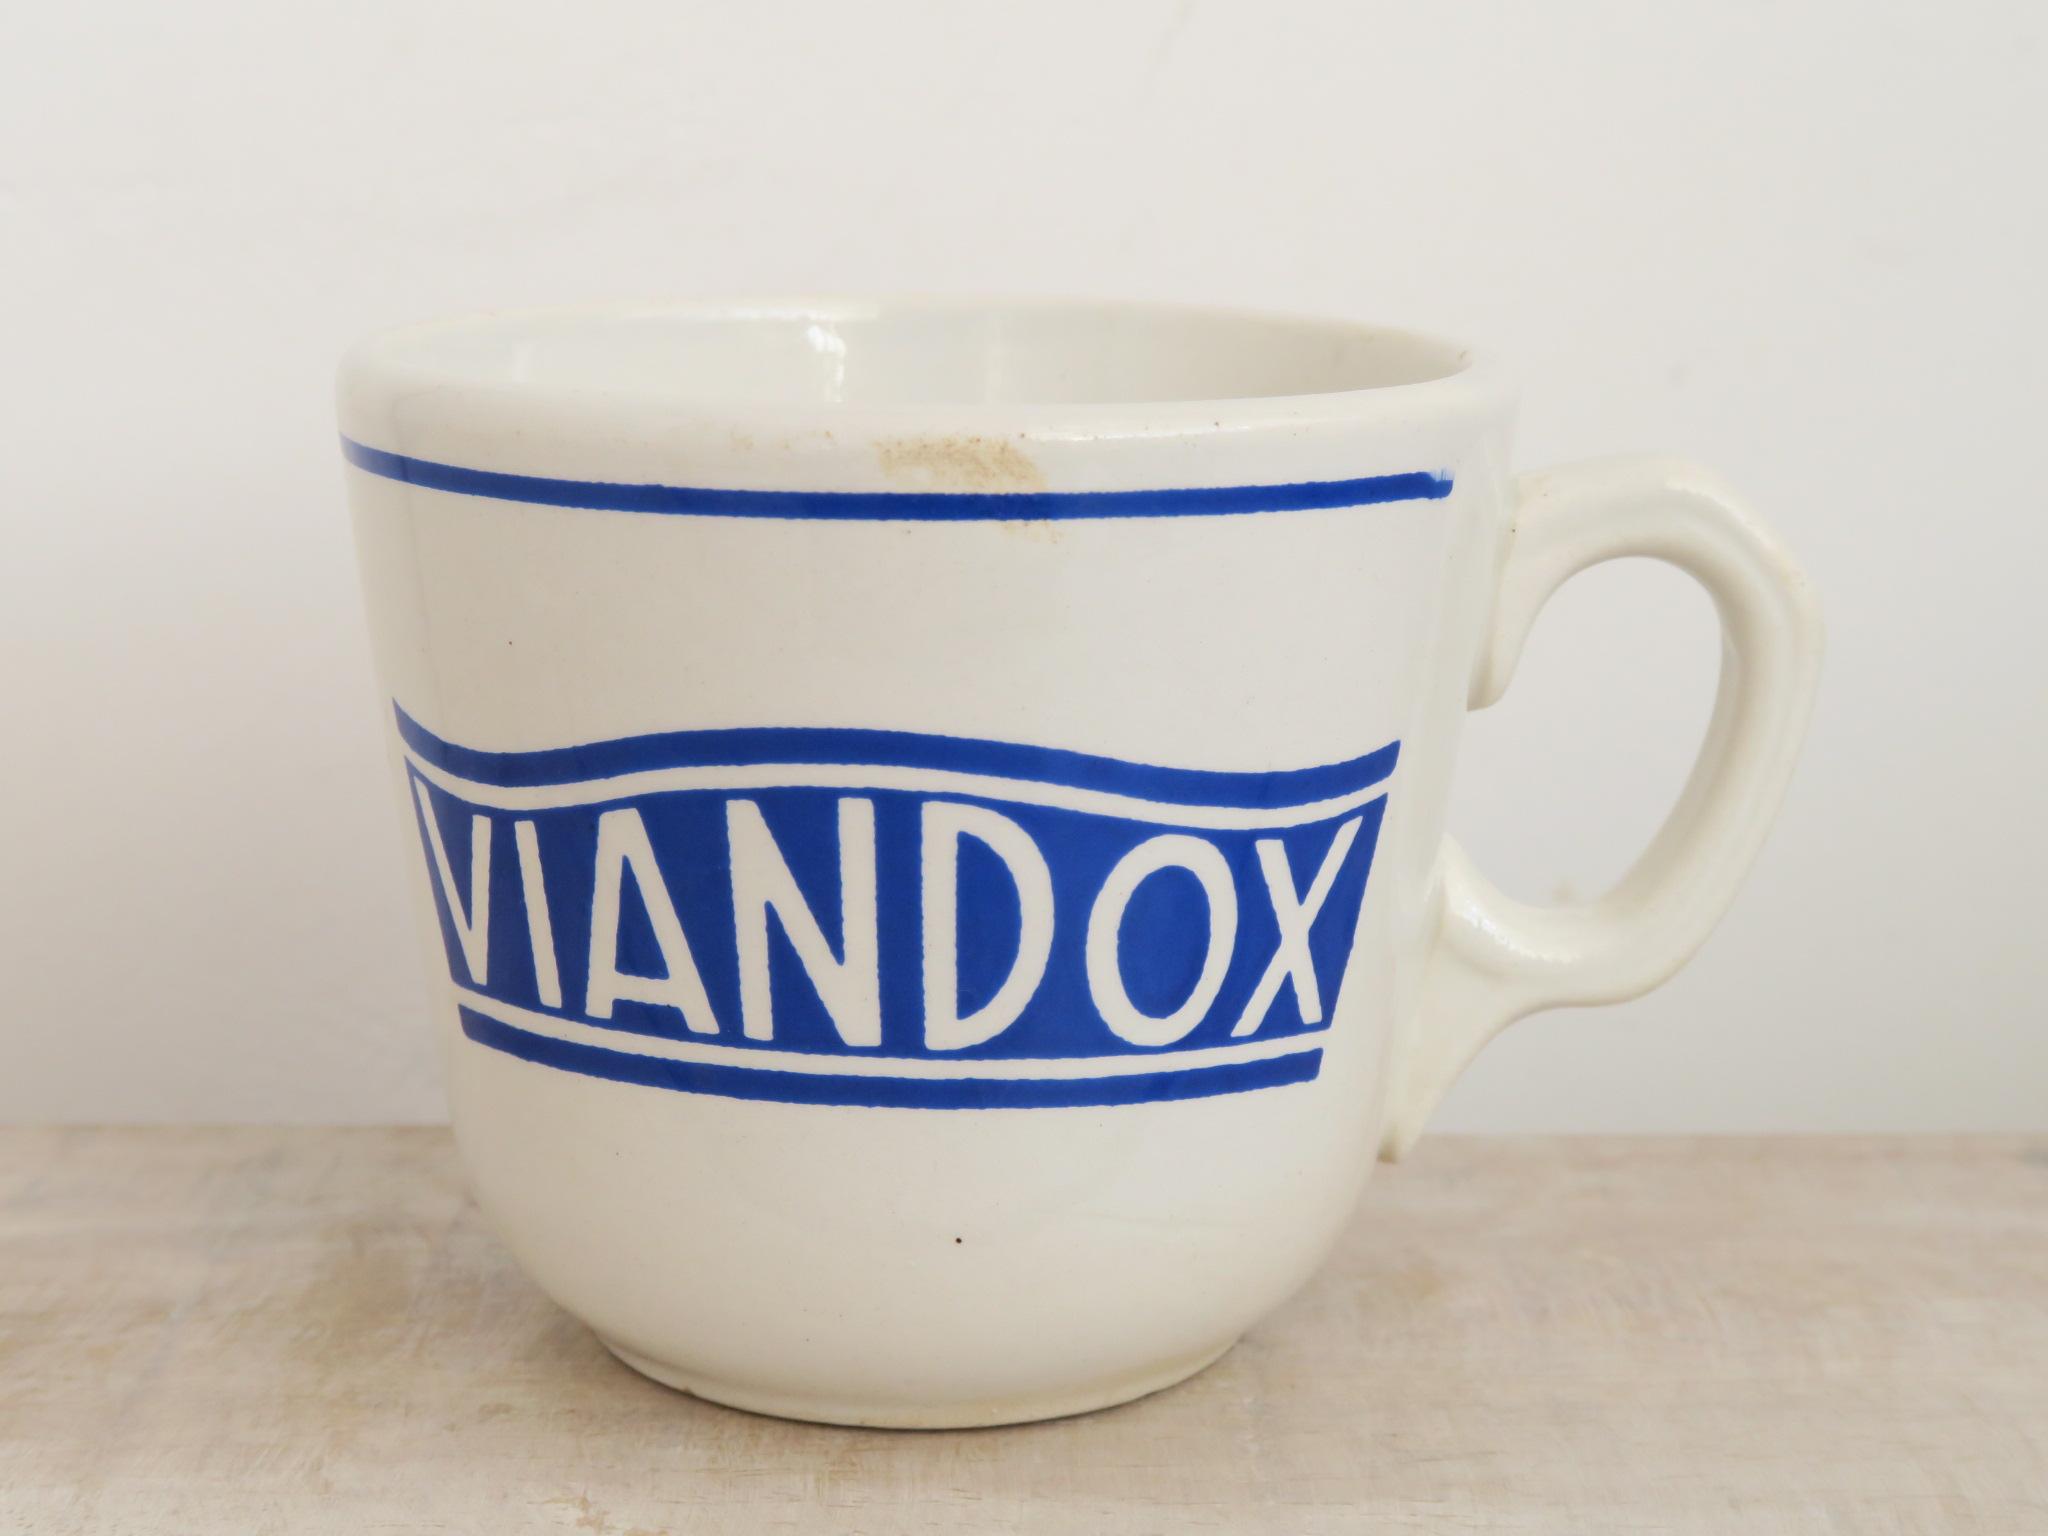 VIANDOX マグカップ